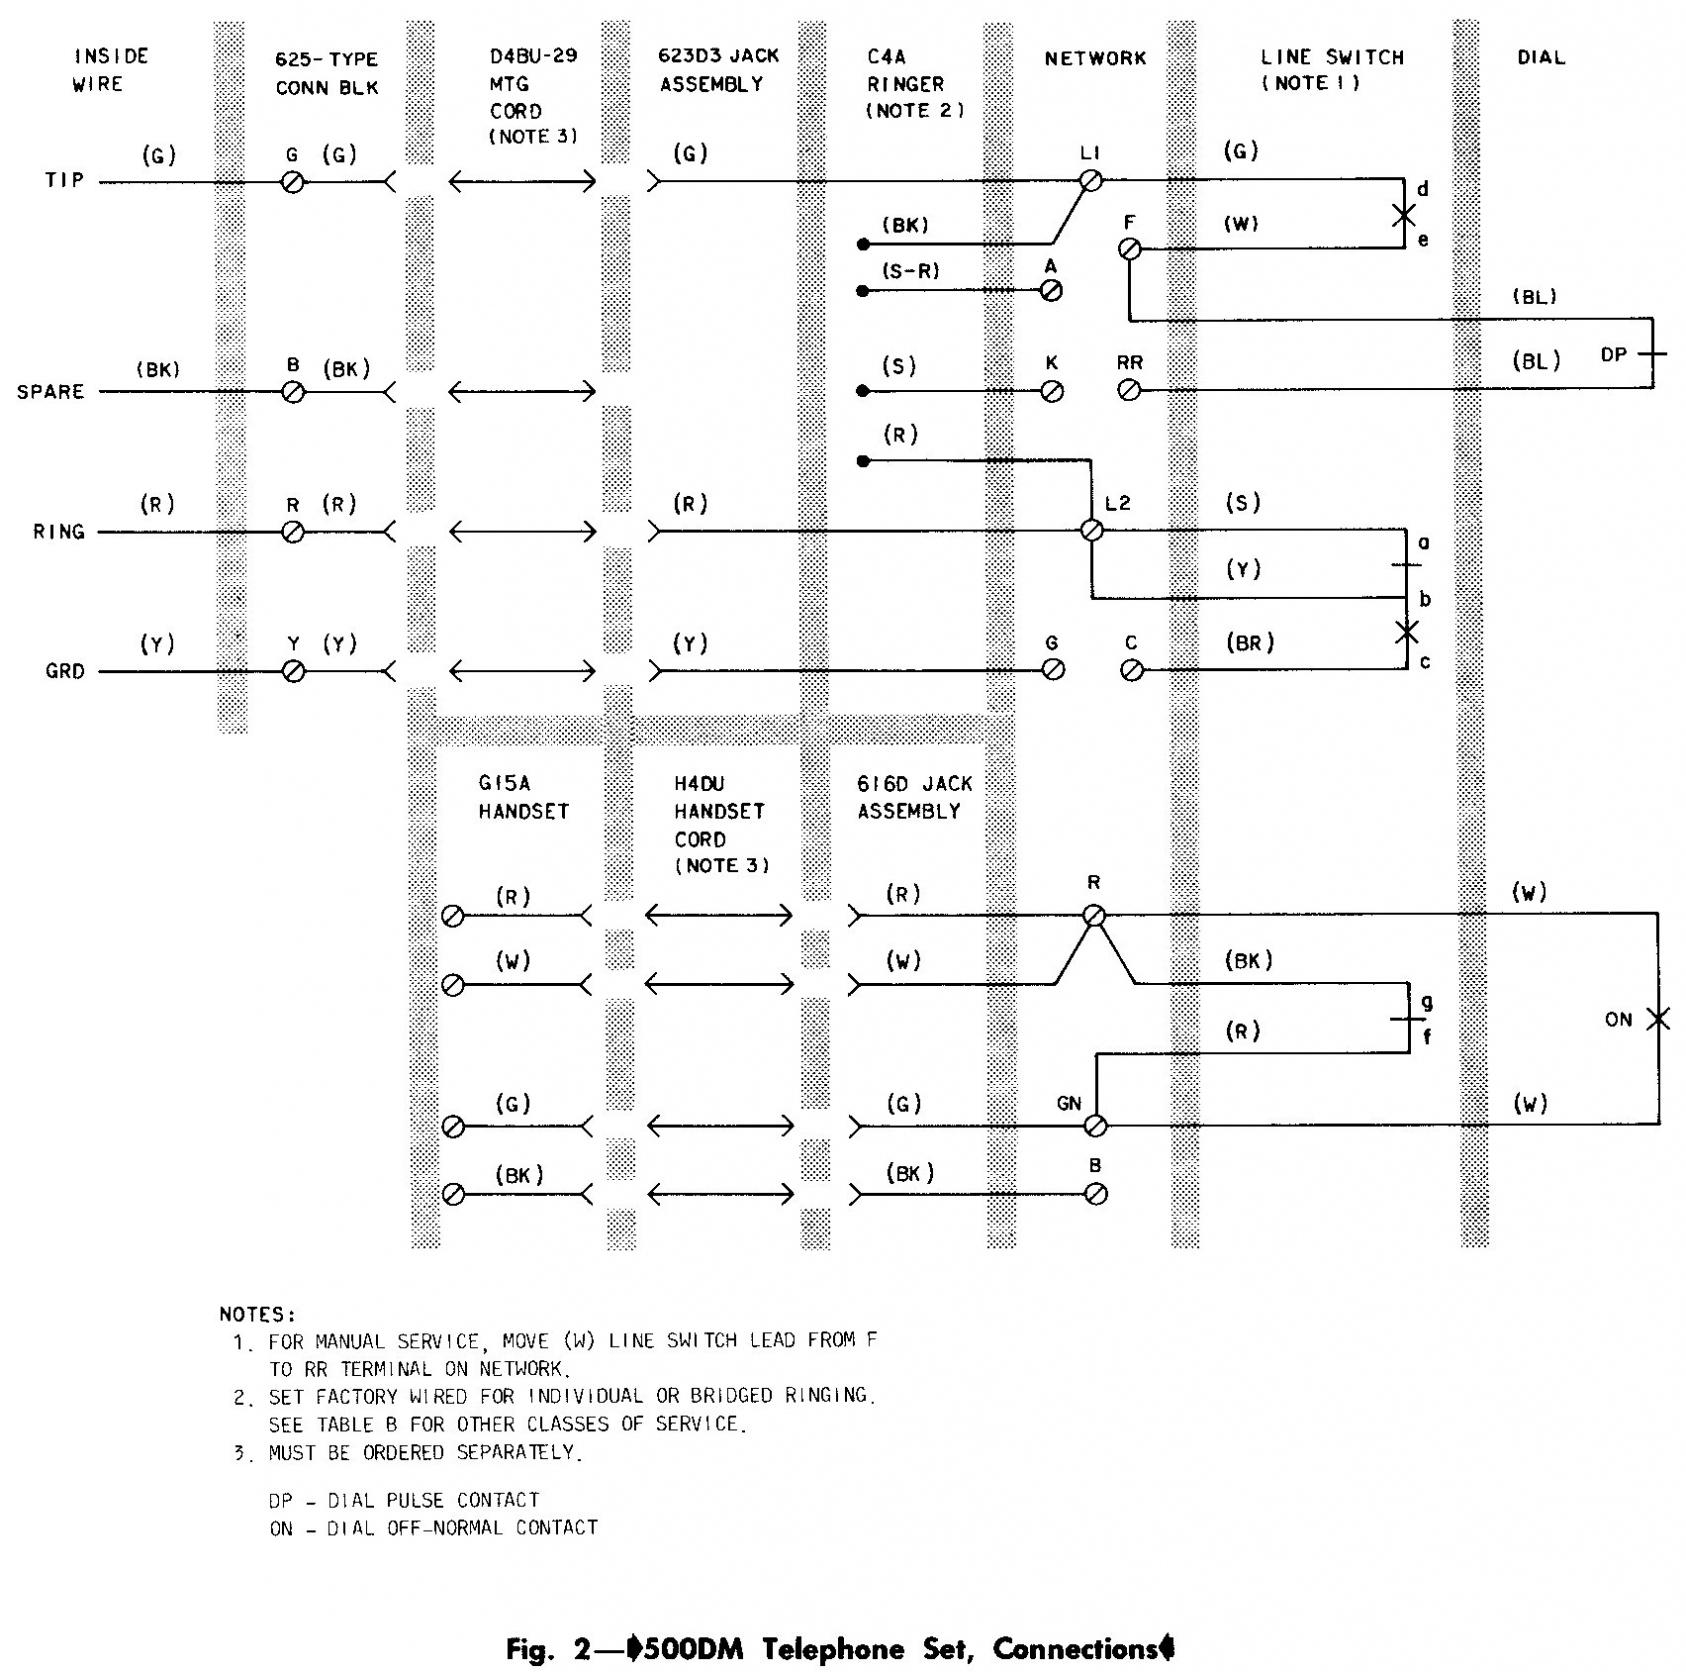 Home Phone Wiring Diagram Australia Inspirationa Lovely Telephone - Telephone Wiring Diagram